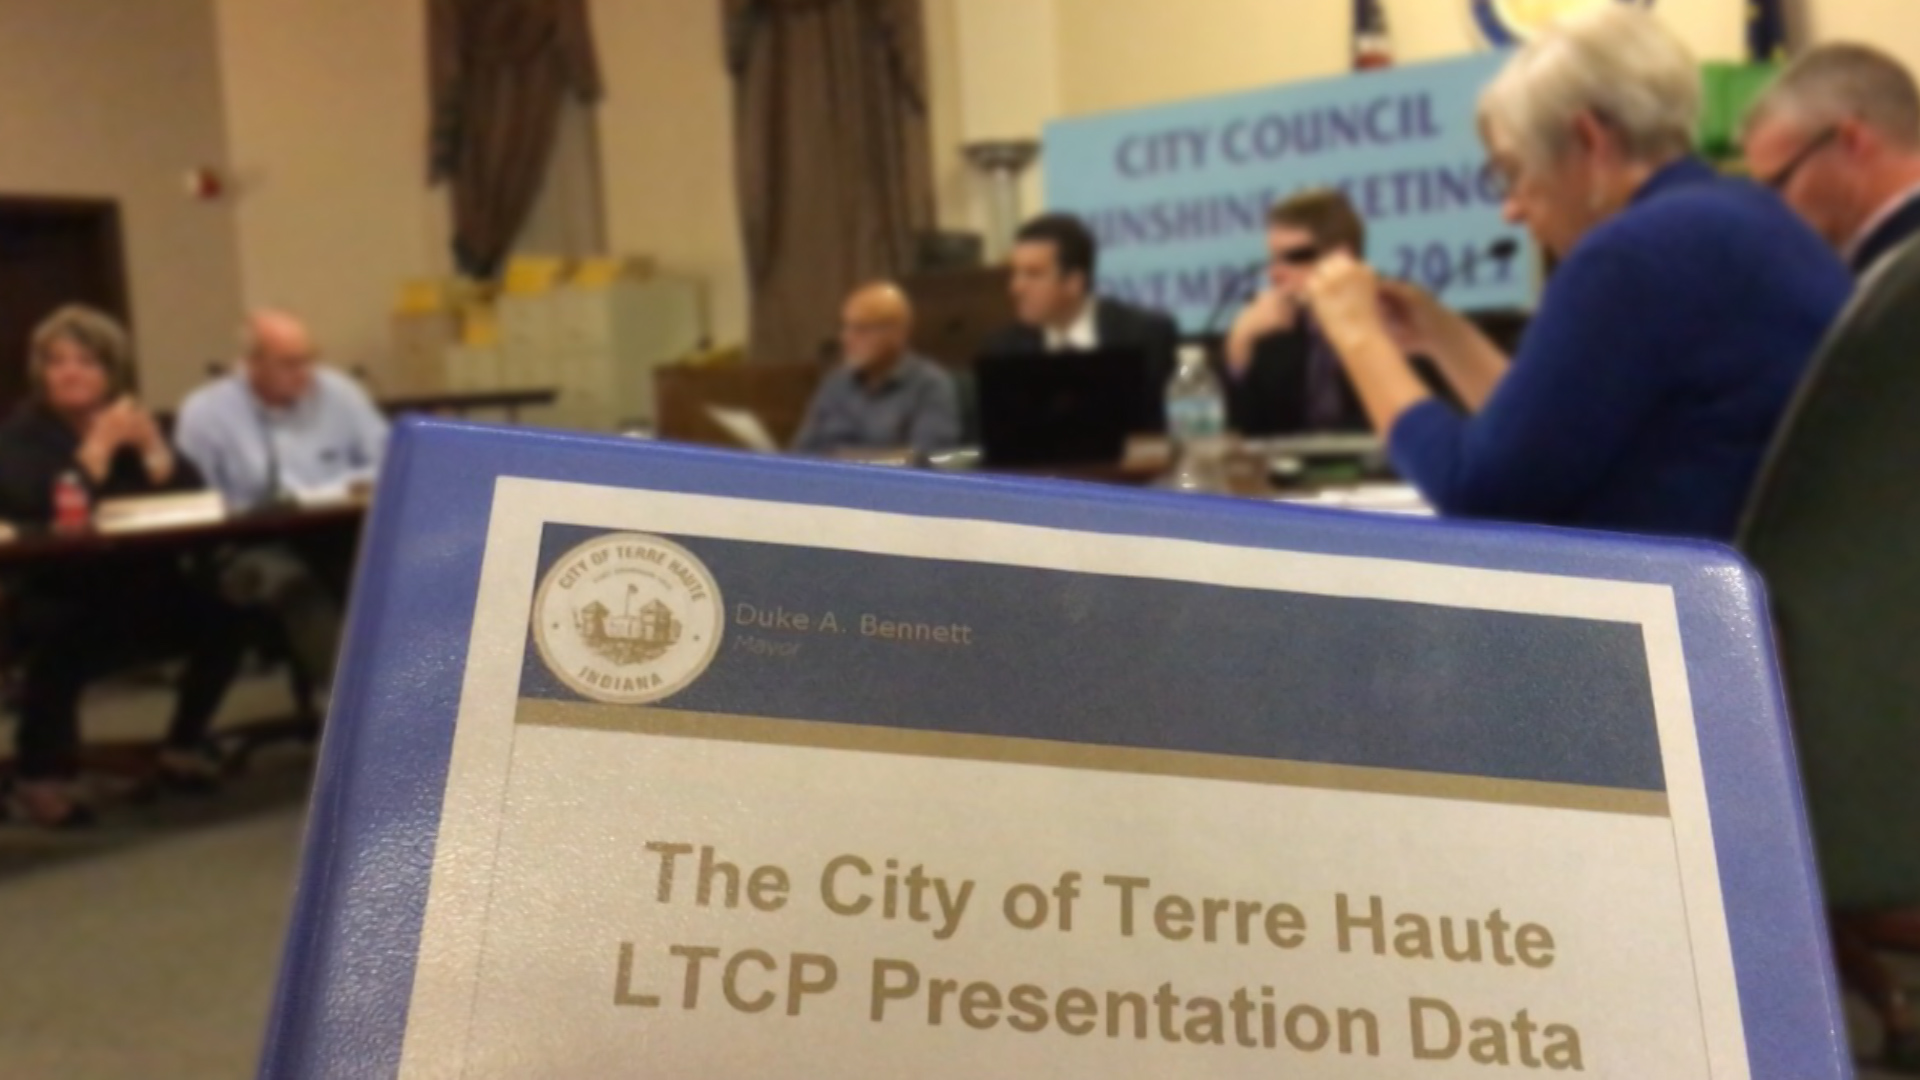 thcc presentation_1509676206383.jpg